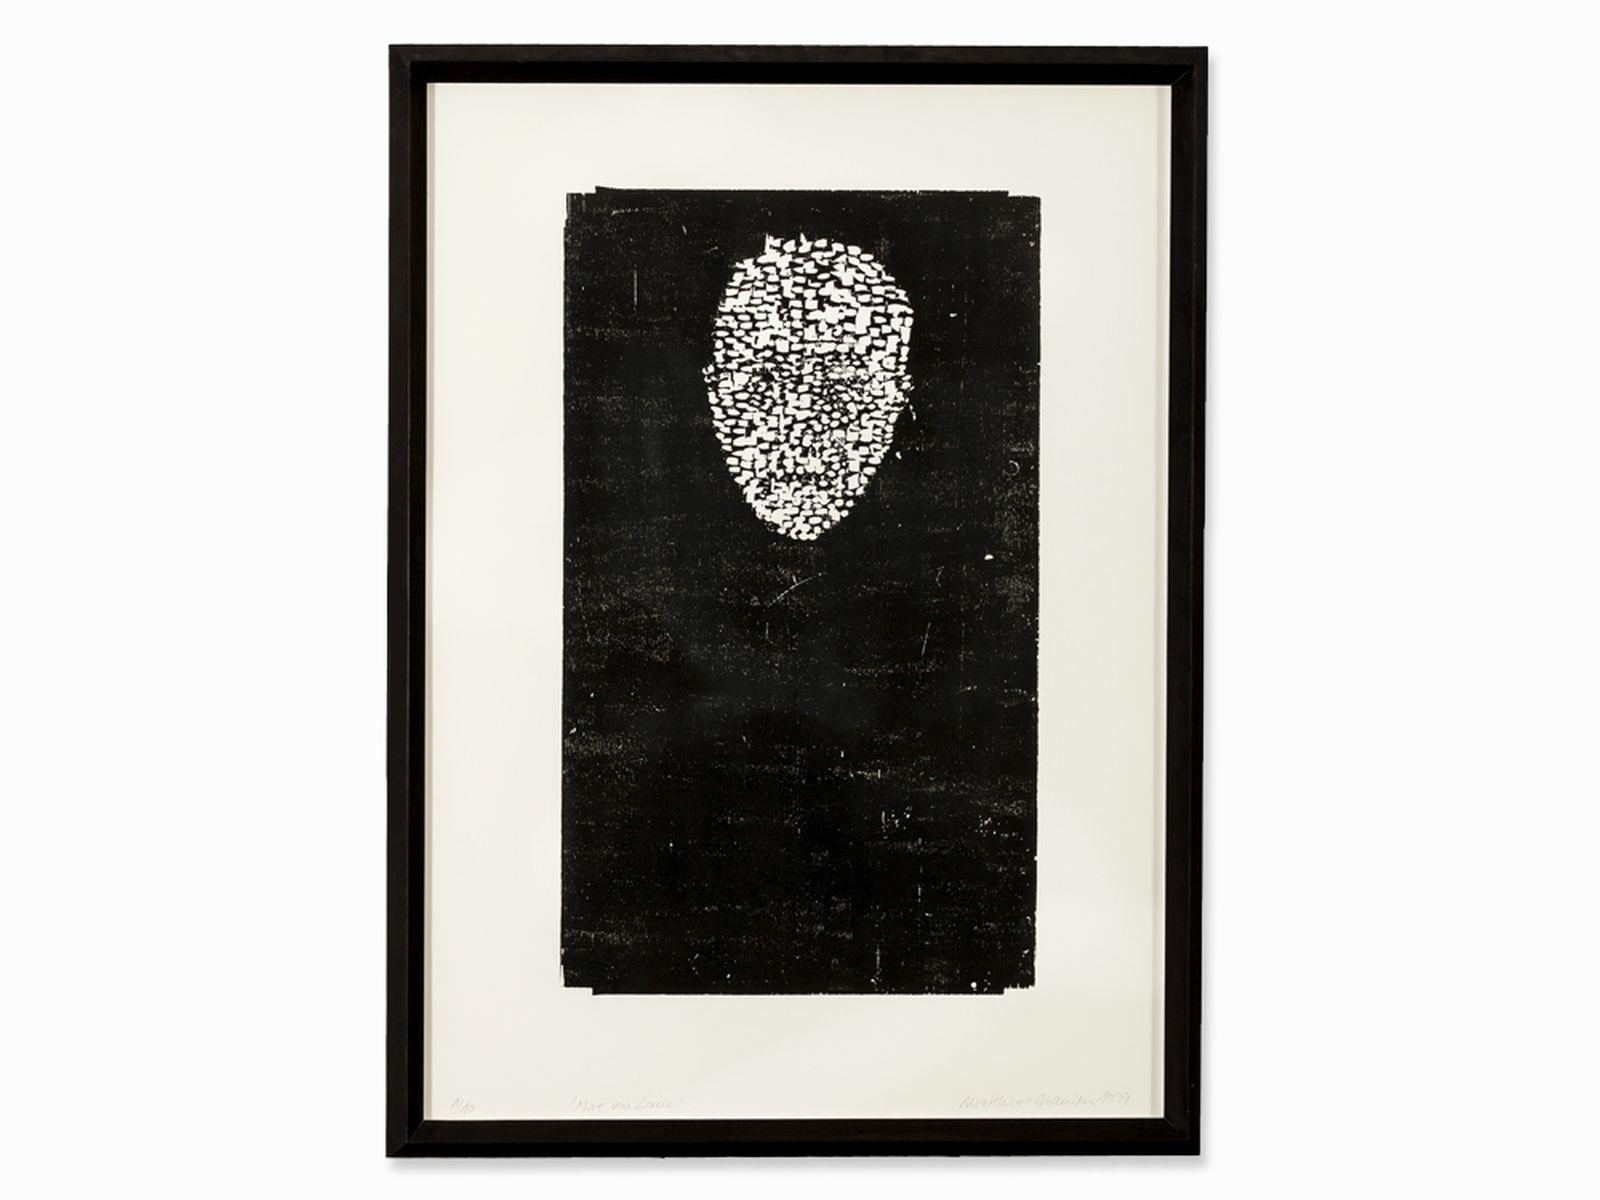 #50 Matthias Mansen (b. 1958), Max von Laue, Woodcut, 1999 | Matthias Mansen (geb. 1958) Image